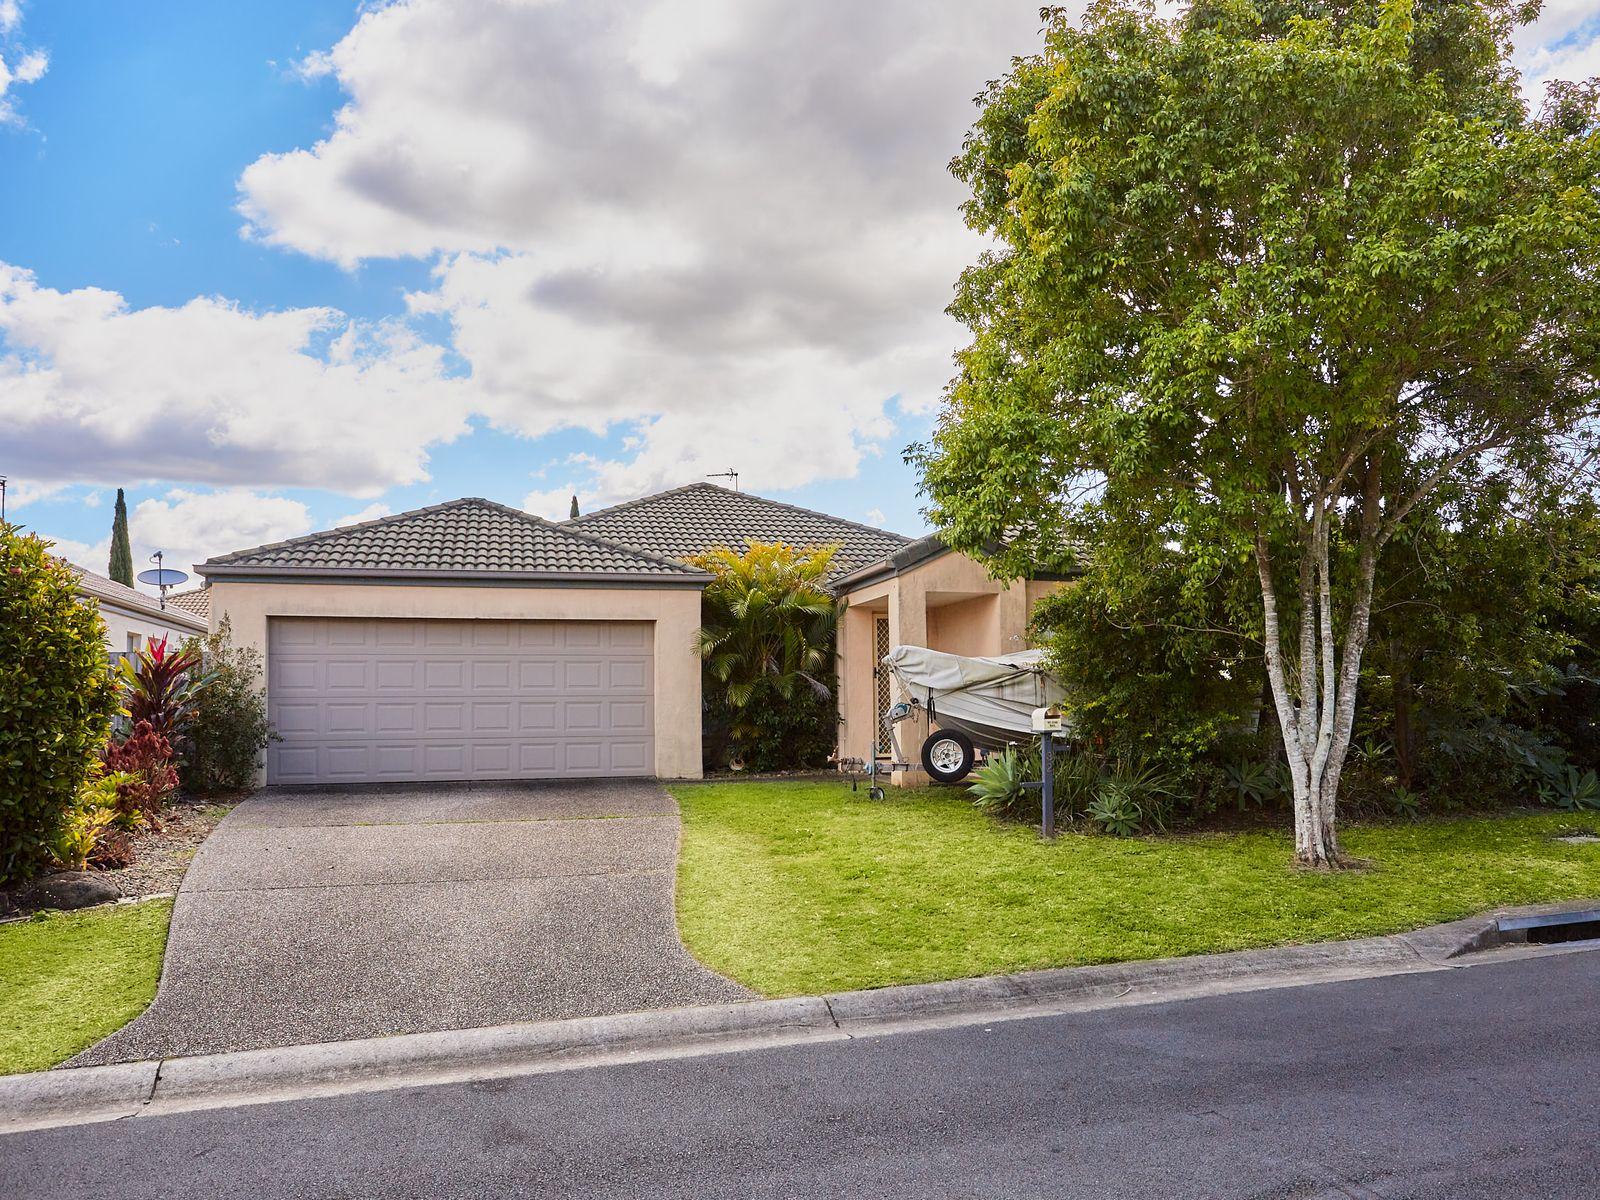 32 Inwood Circuit, Merrimac, QLD 4226